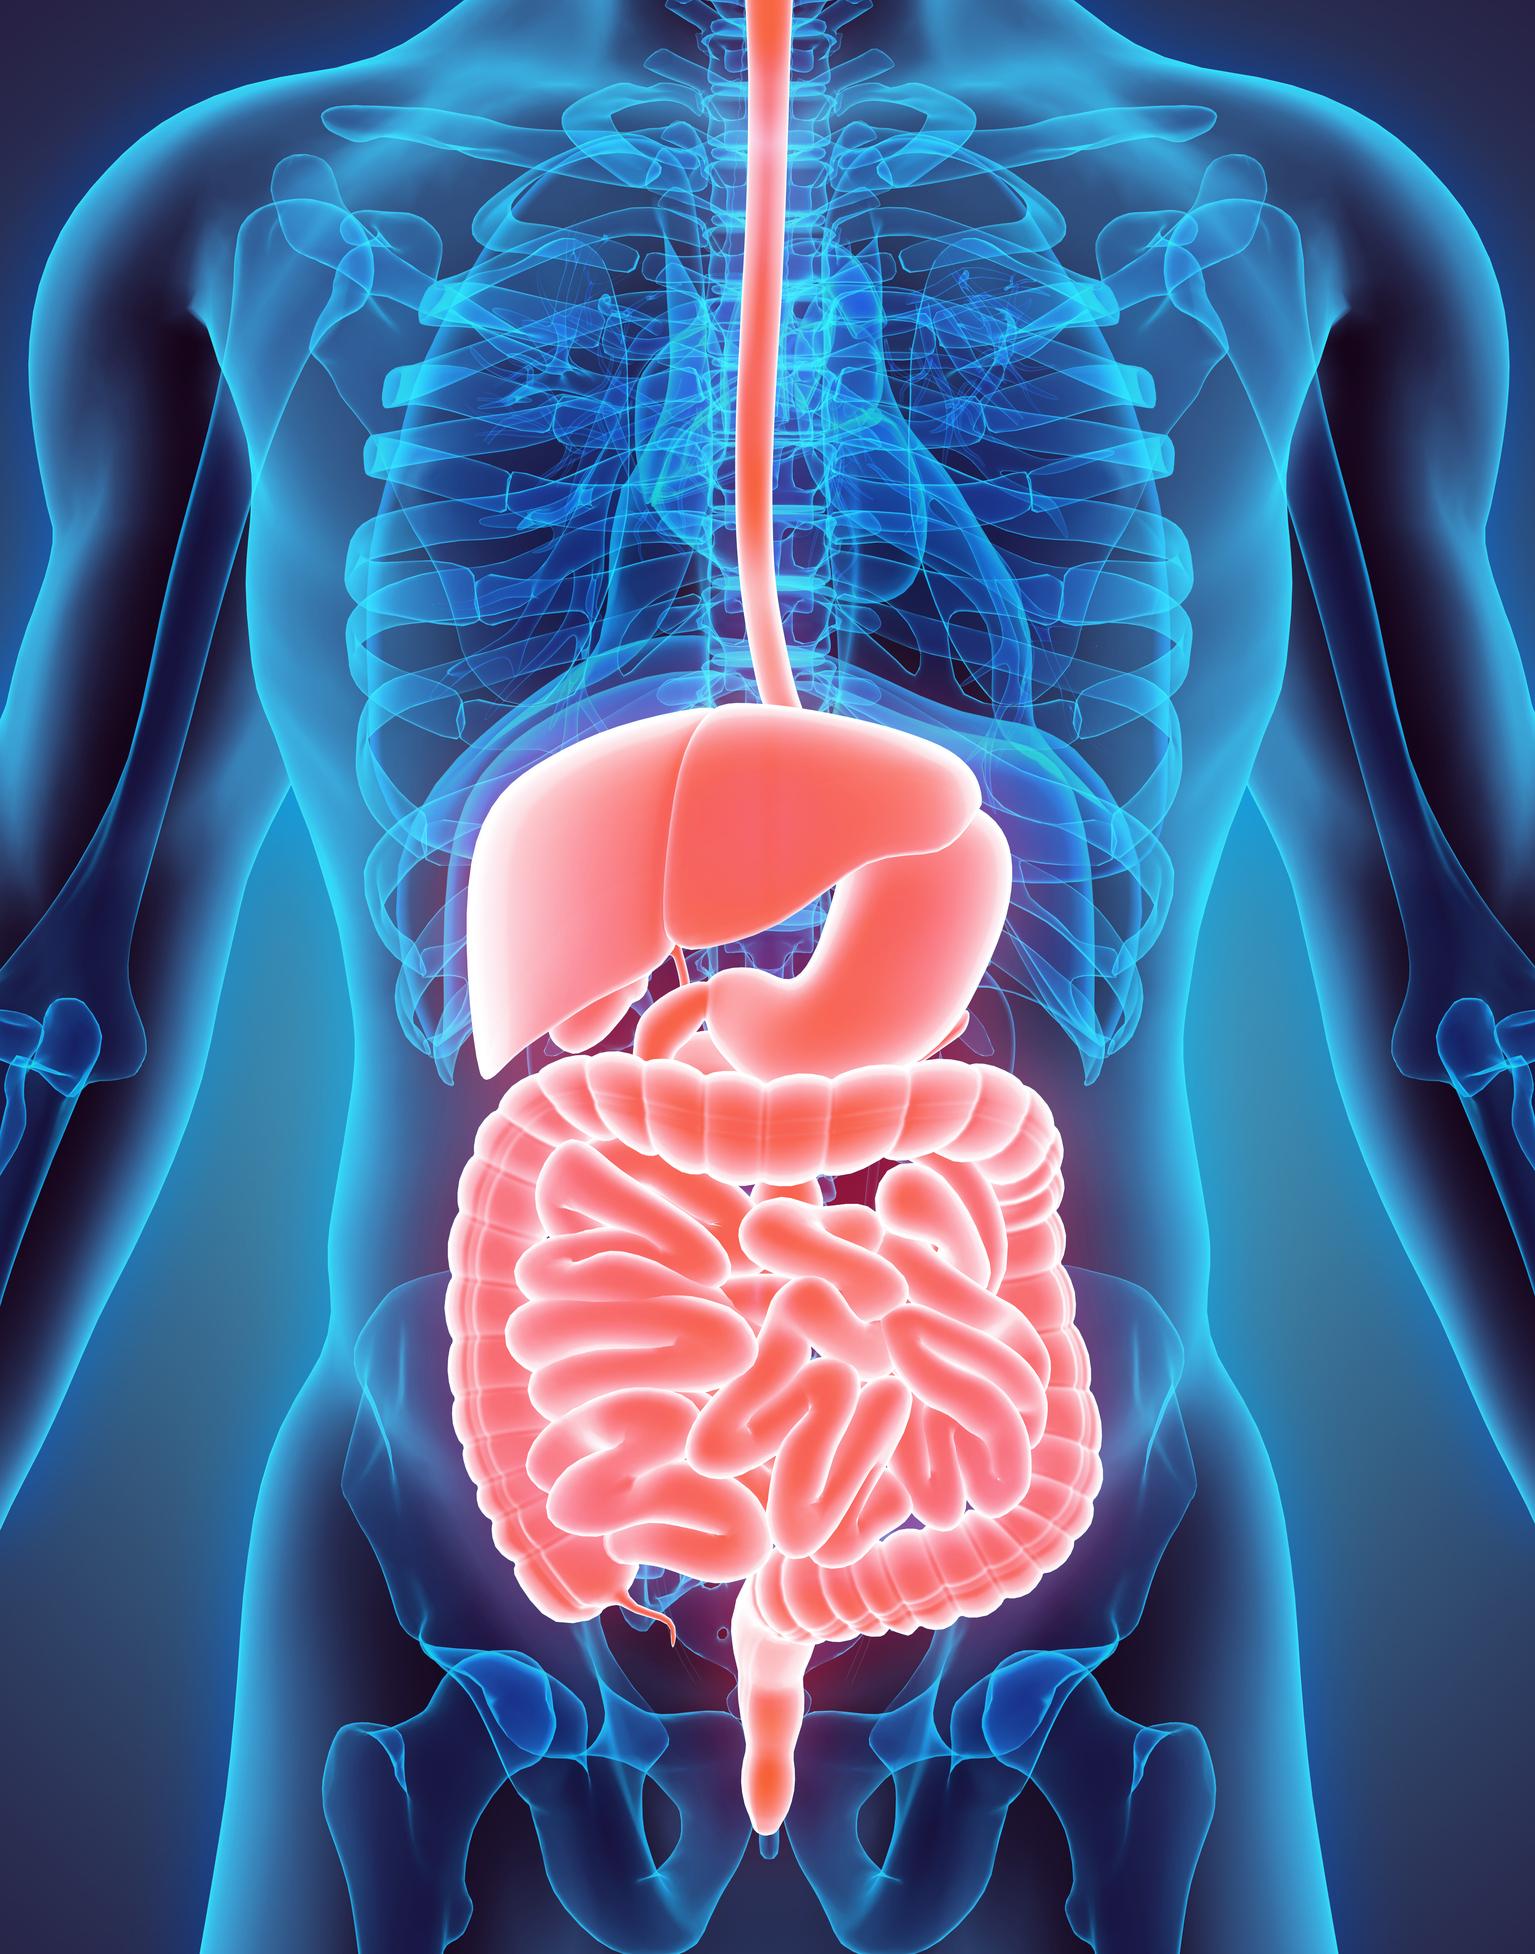 Gastrointestinal Cancer - West Cancer Center